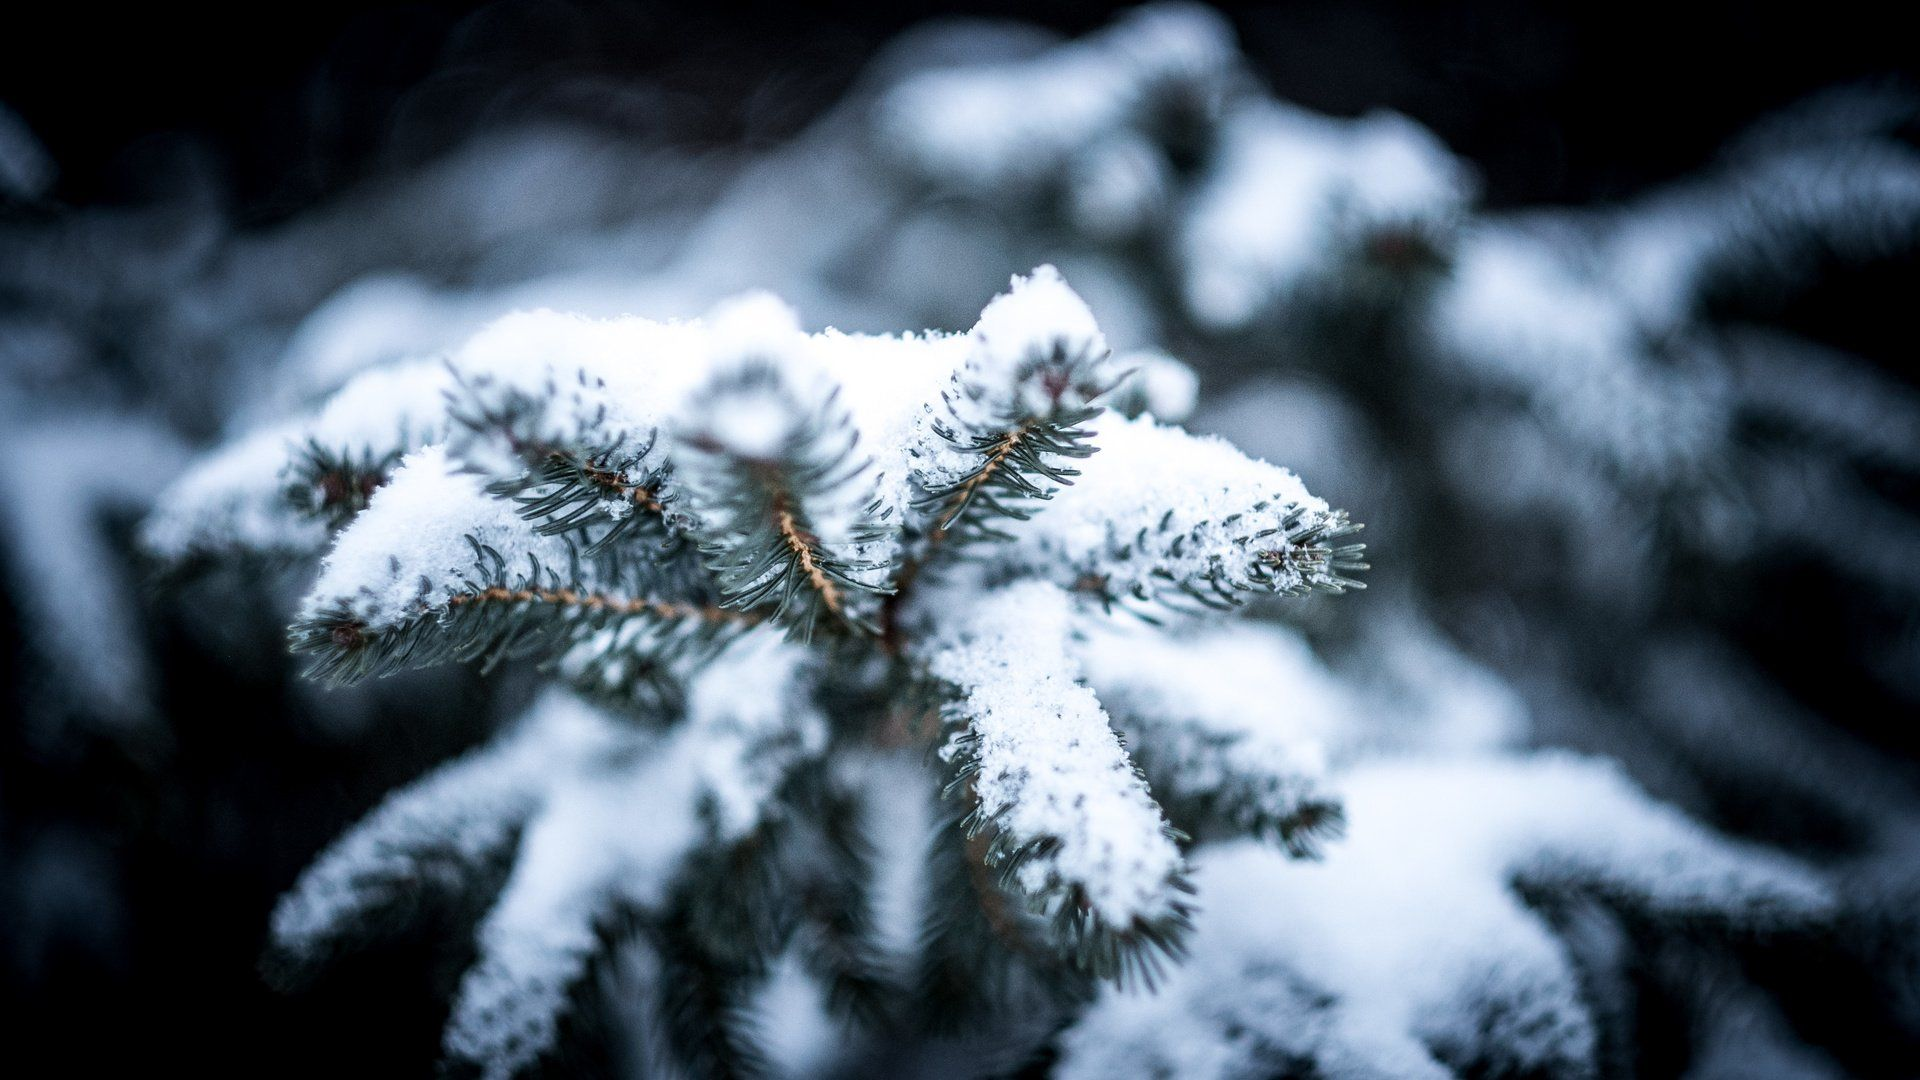 Macro Winter Image